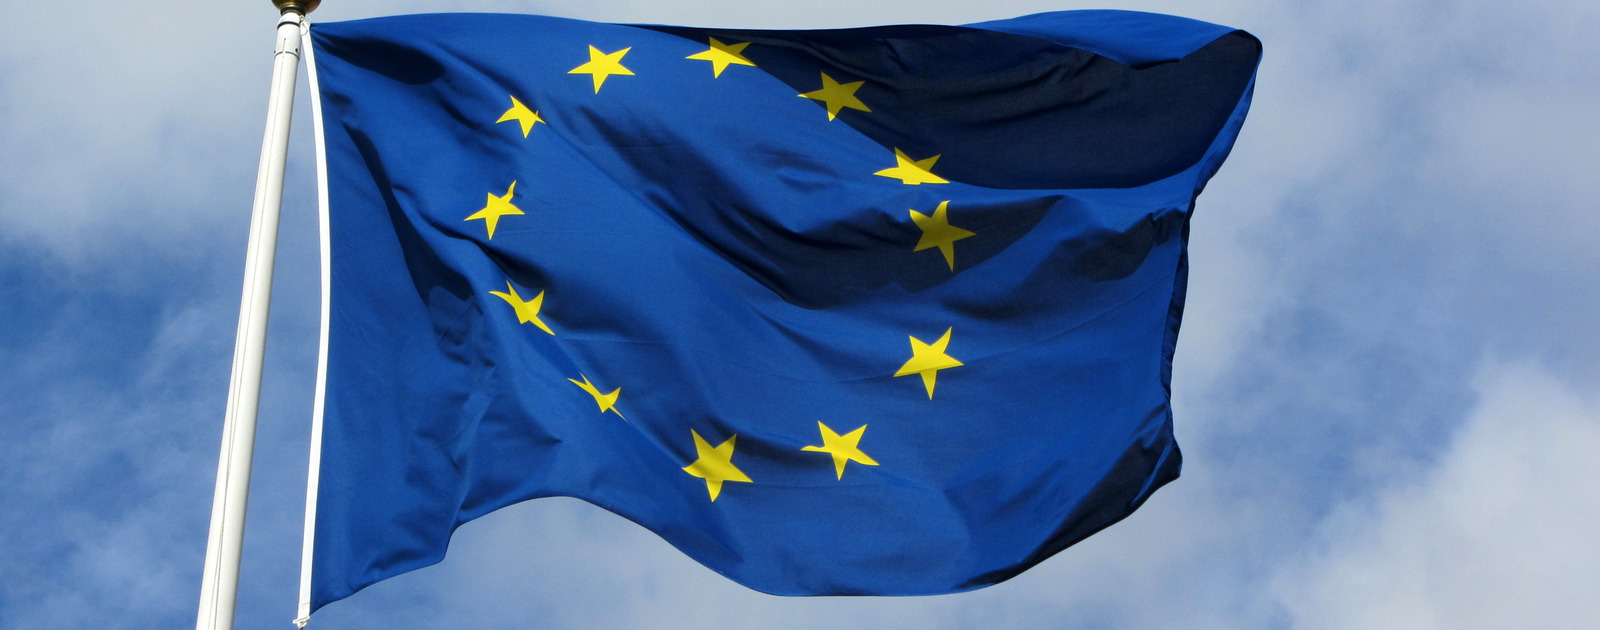 Image of European Flag